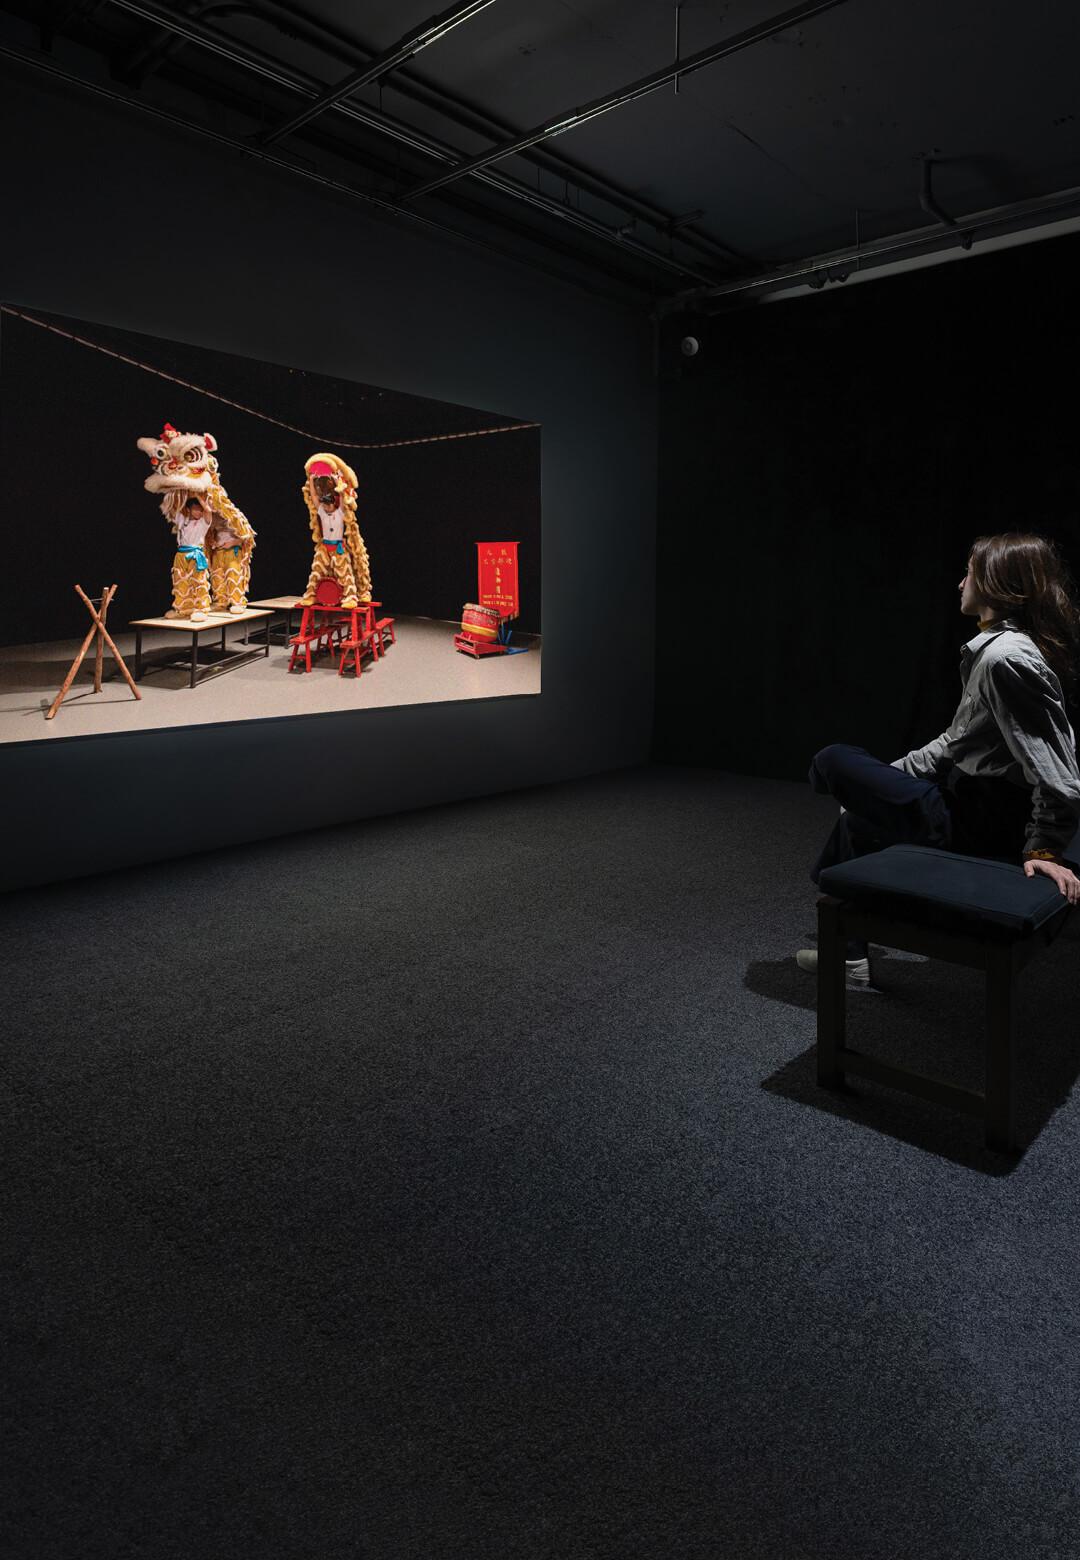 Samson Young, Muted Situation #2: Muted Lion Dance (2014) on view at Seeing Sound at KADIST San Francisco | Seeing Sound | KADIST | STIRworld